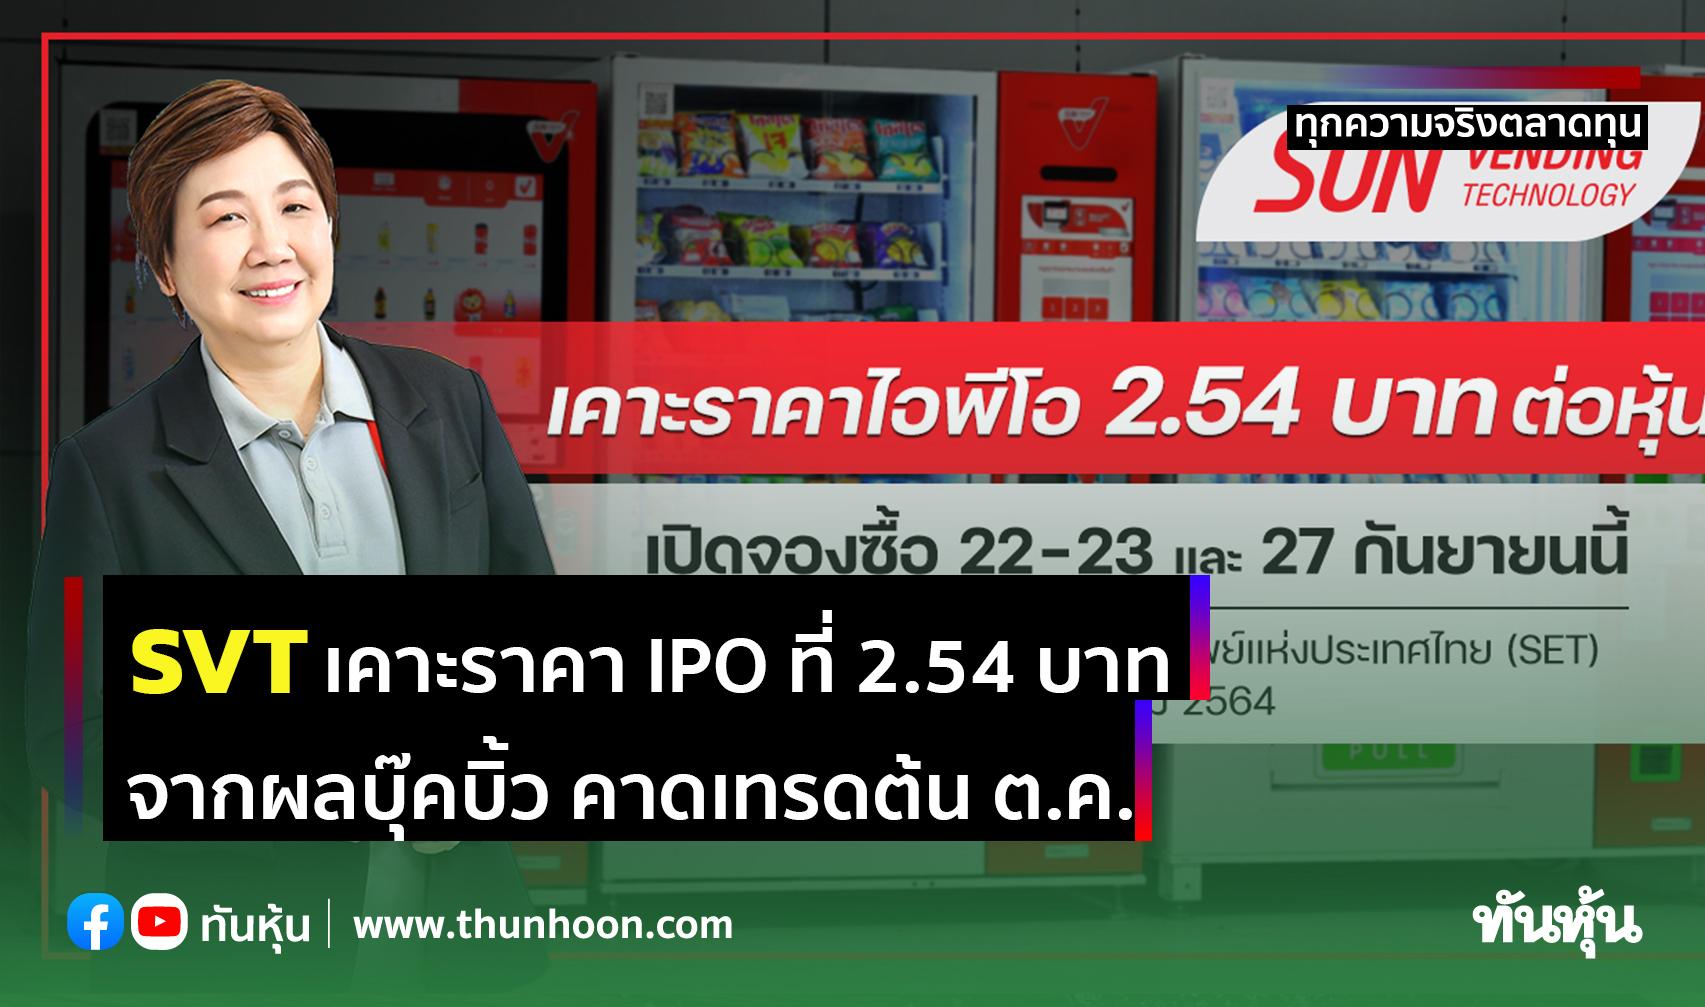 SVT เคาะราคา IPO ที่ 2.54 บาทจากผลบุ๊คบิ้ว คาดเทรดต้น ต.ค.